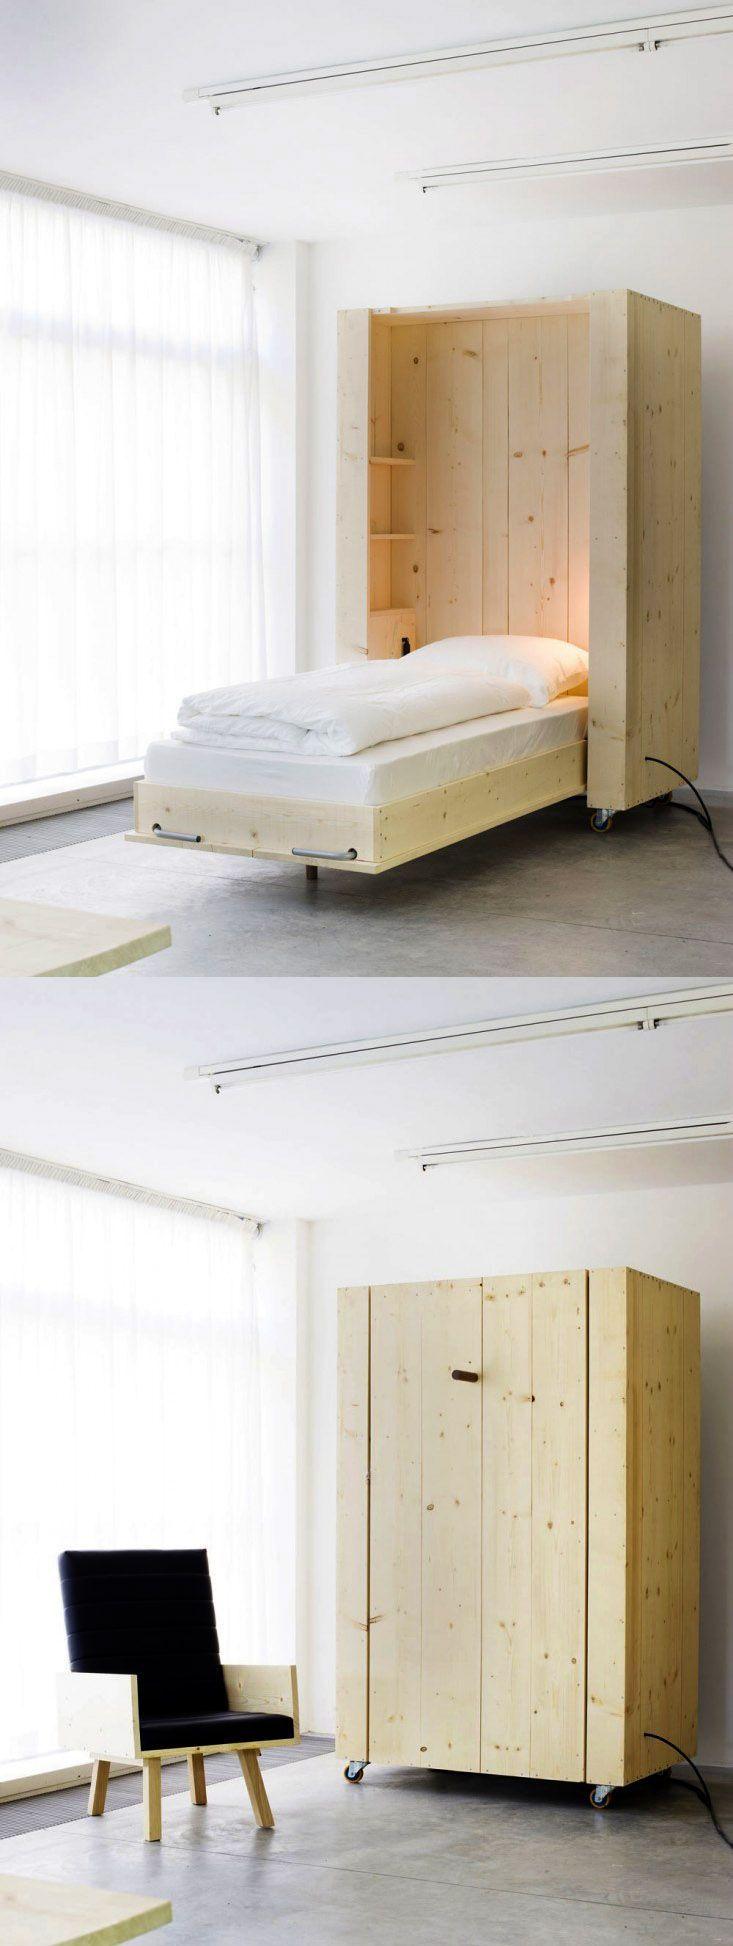 hundeh tte selber bauen anleitung futterhaus bauanleitung. Black Bedroom Furniture Sets. Home Design Ideas